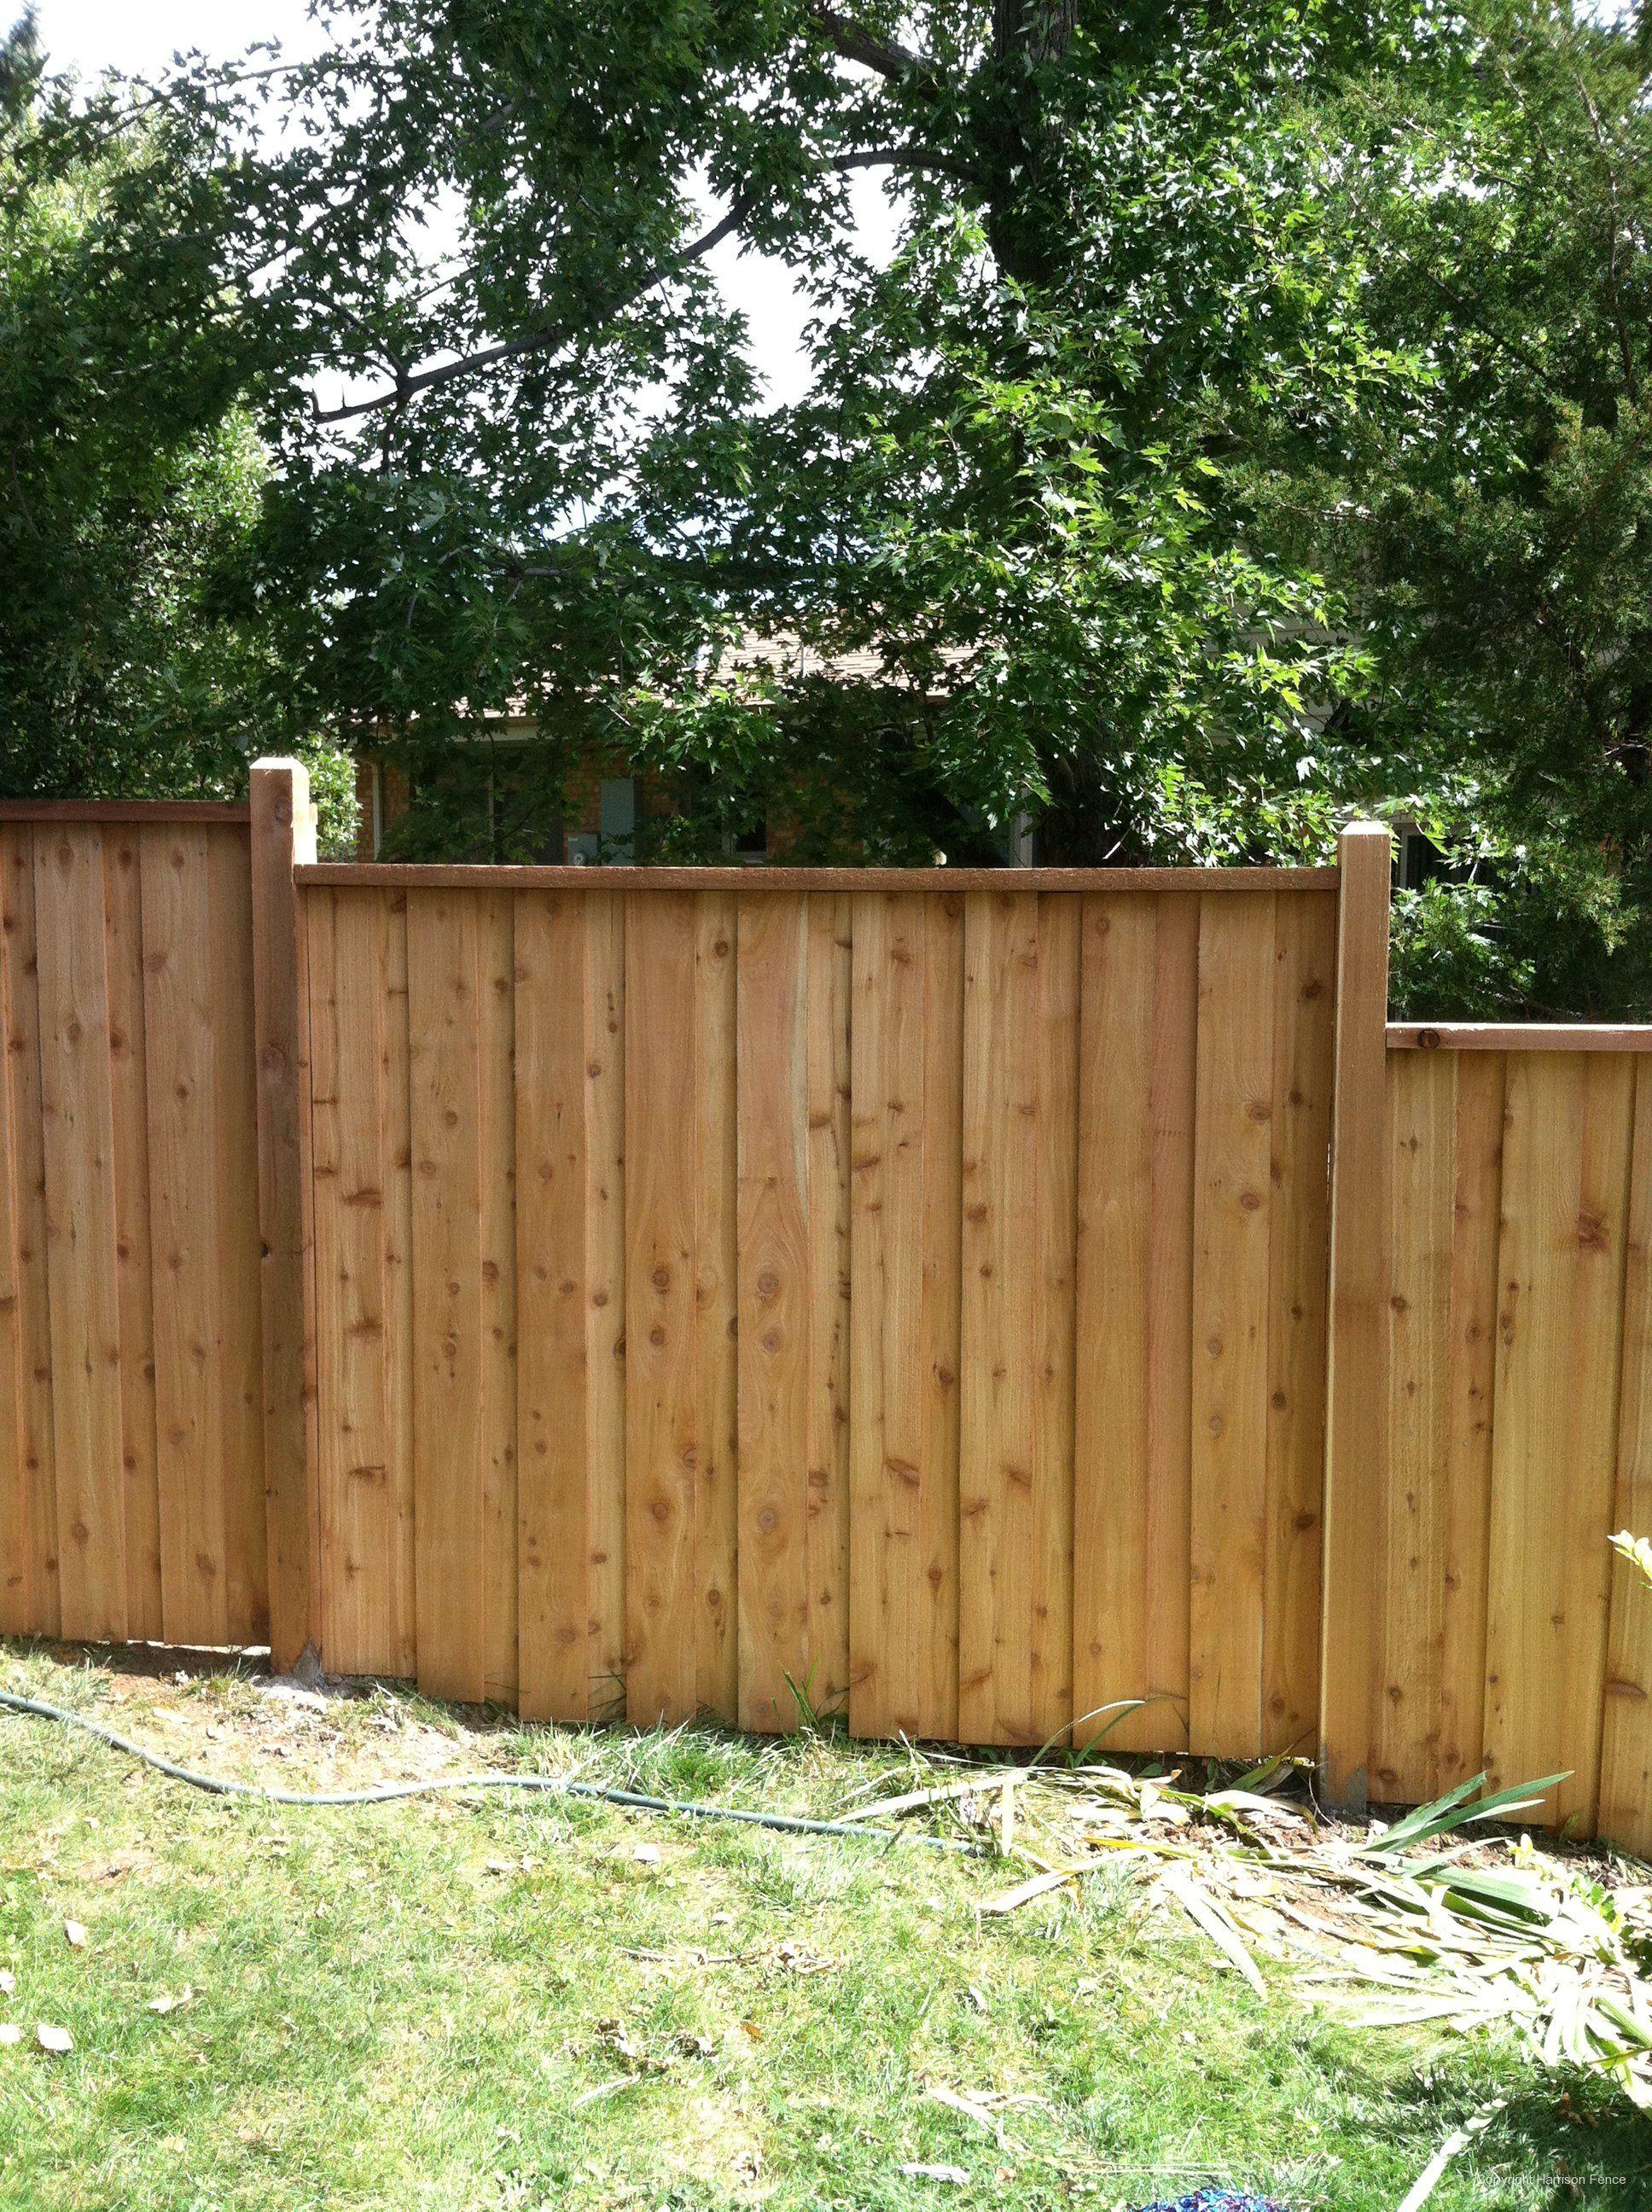 Wood Privacy Fences Backyard Fences Fence Design Building A Fence